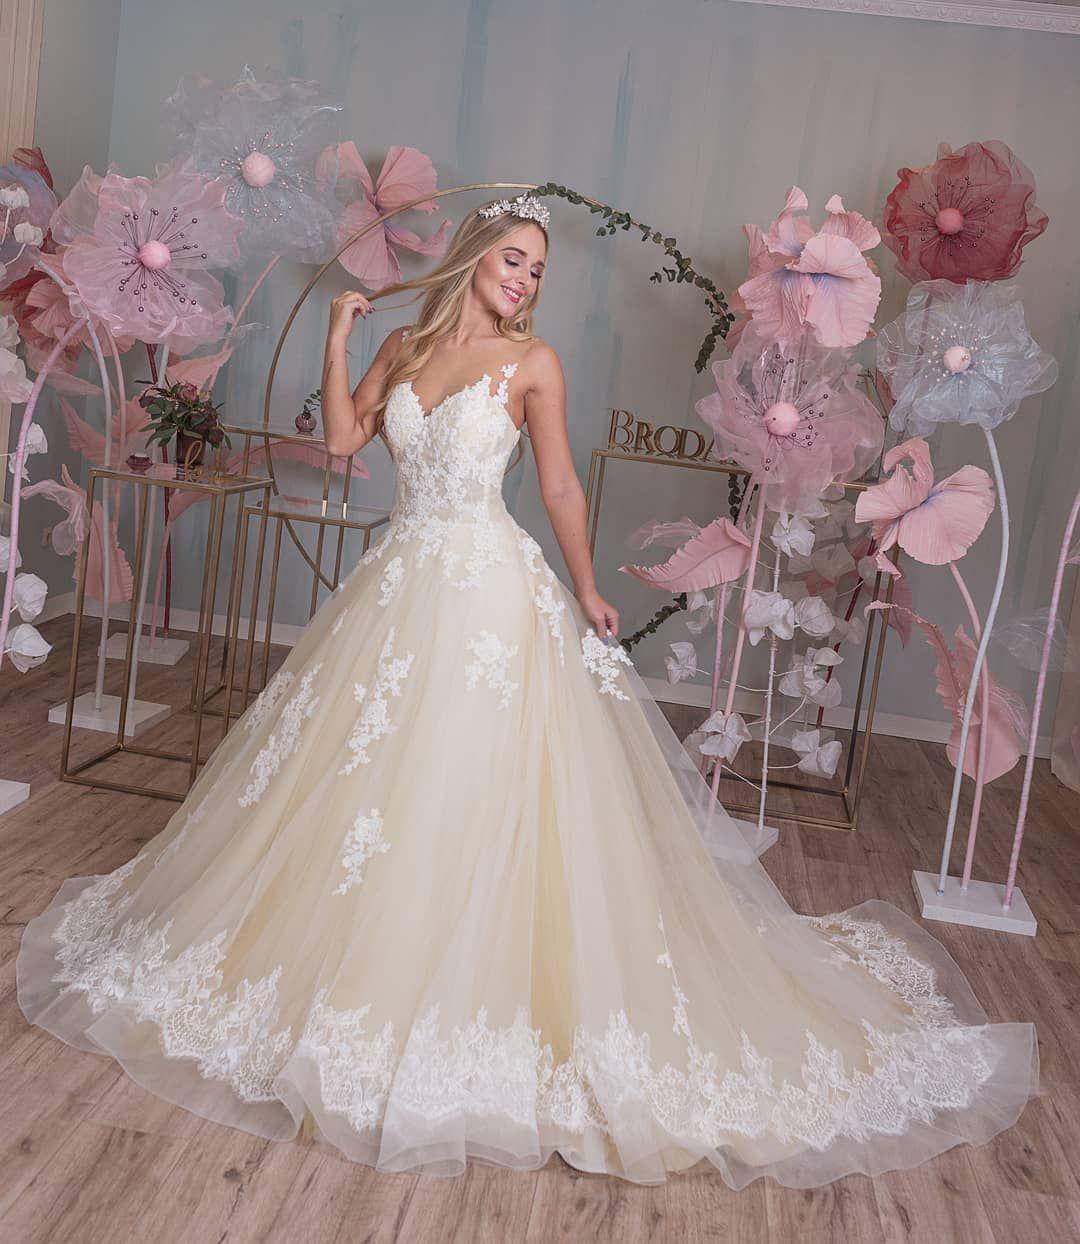 PRINCESS BRIDAL DRESS by BRODANI in 14  Fairytale wedding gown